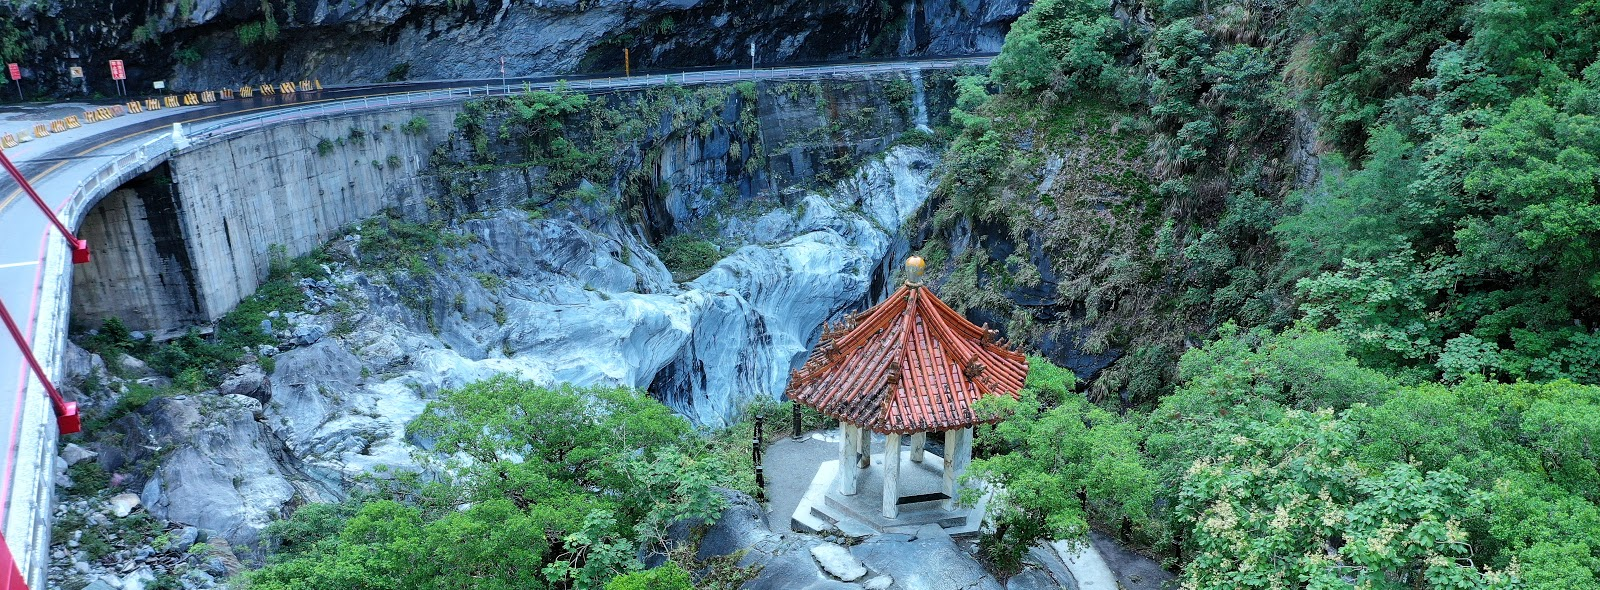 Cycling Wuling Pass East - Taroko Gorge, Liwu River, marble walls, roadway